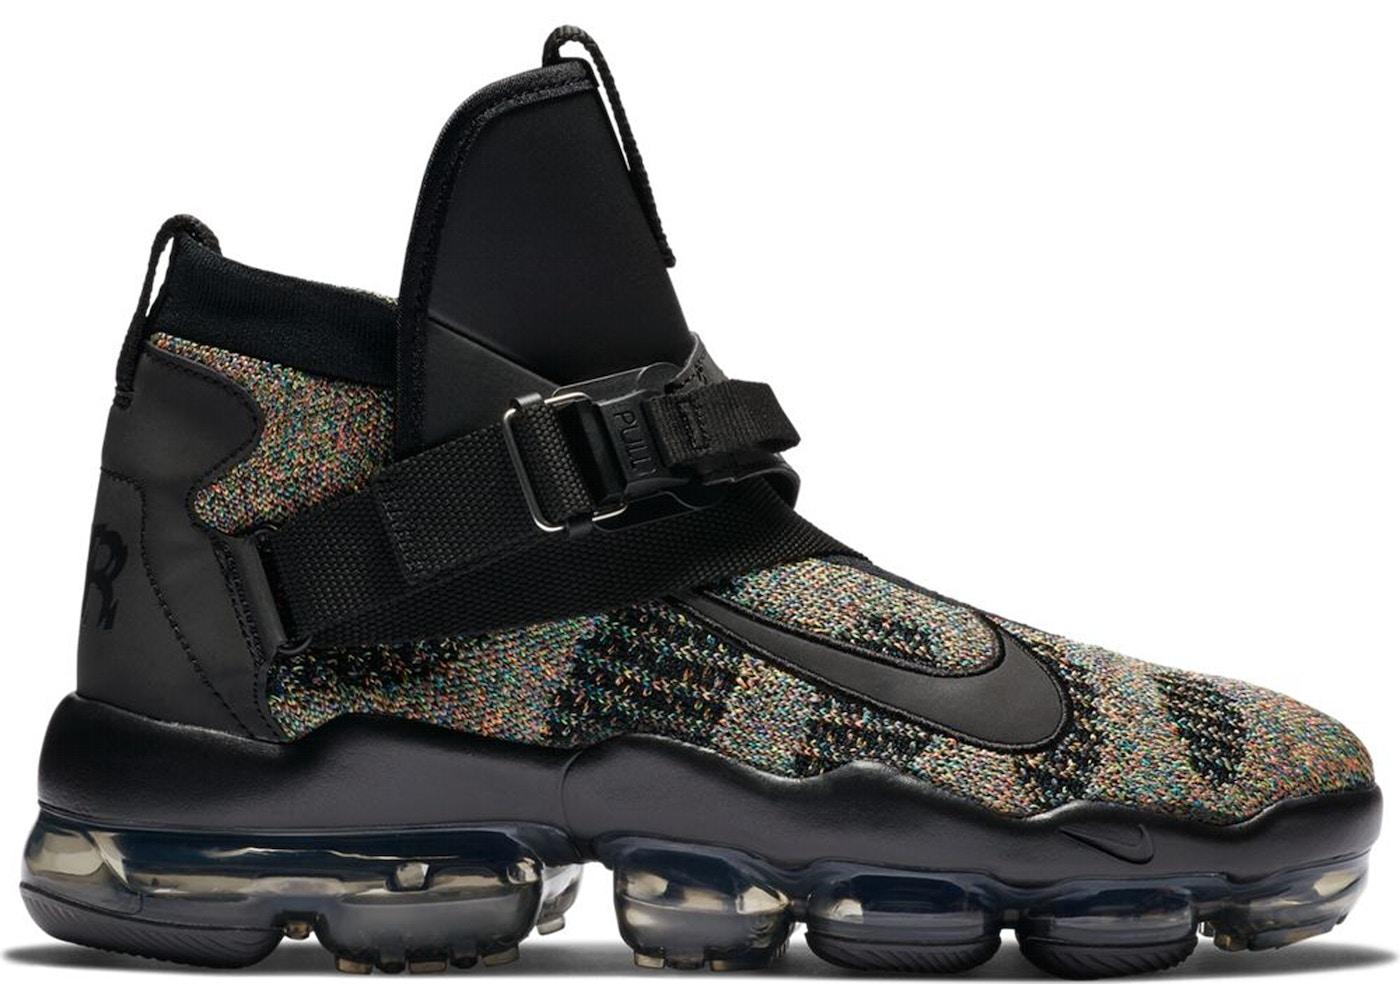 f92a84169789 Nike VaporMax Premier Flyknit Black Multi-Color - AO3241-003